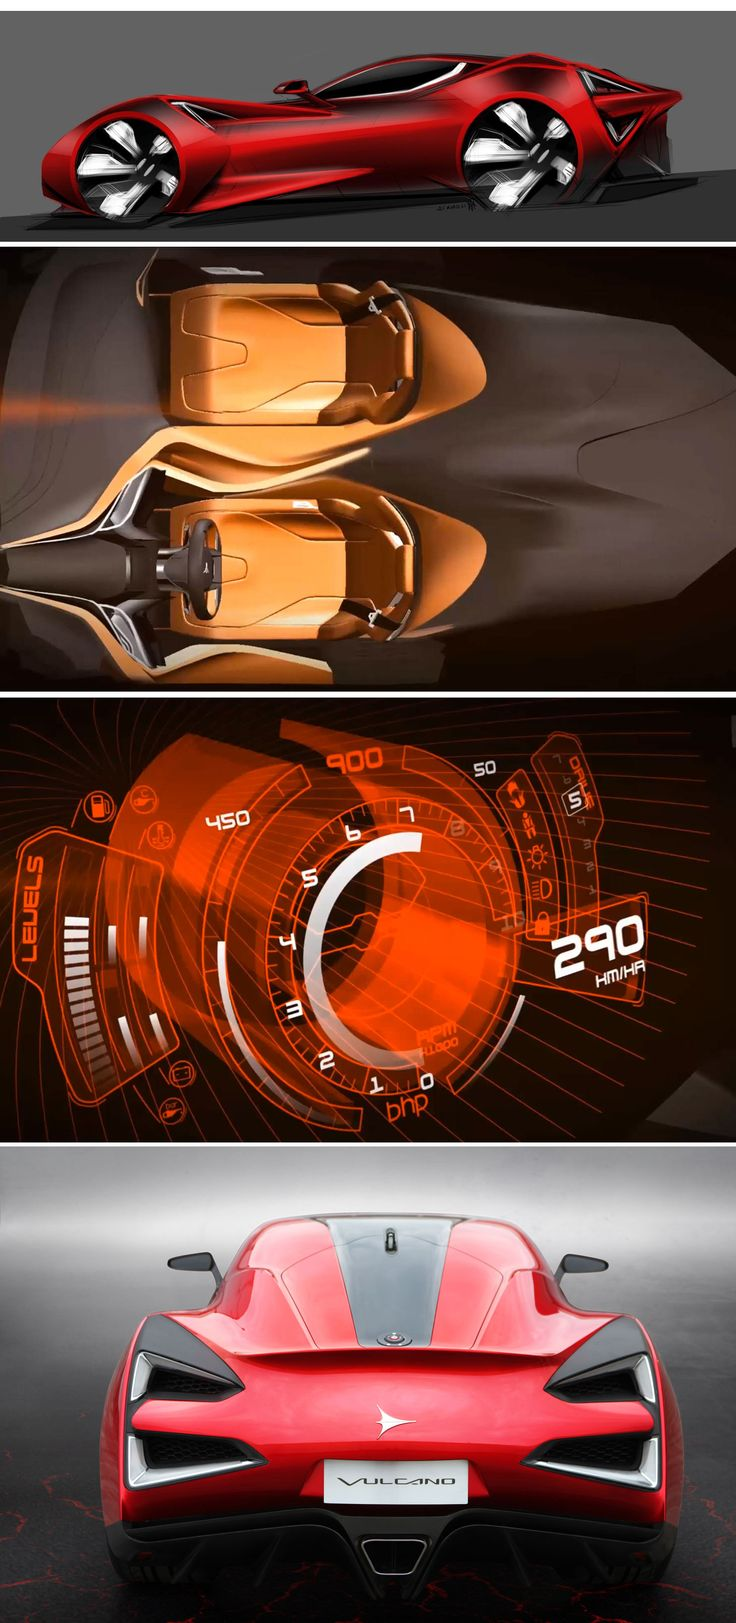 Icona Vulcano - Great supercar design sketches & 3D